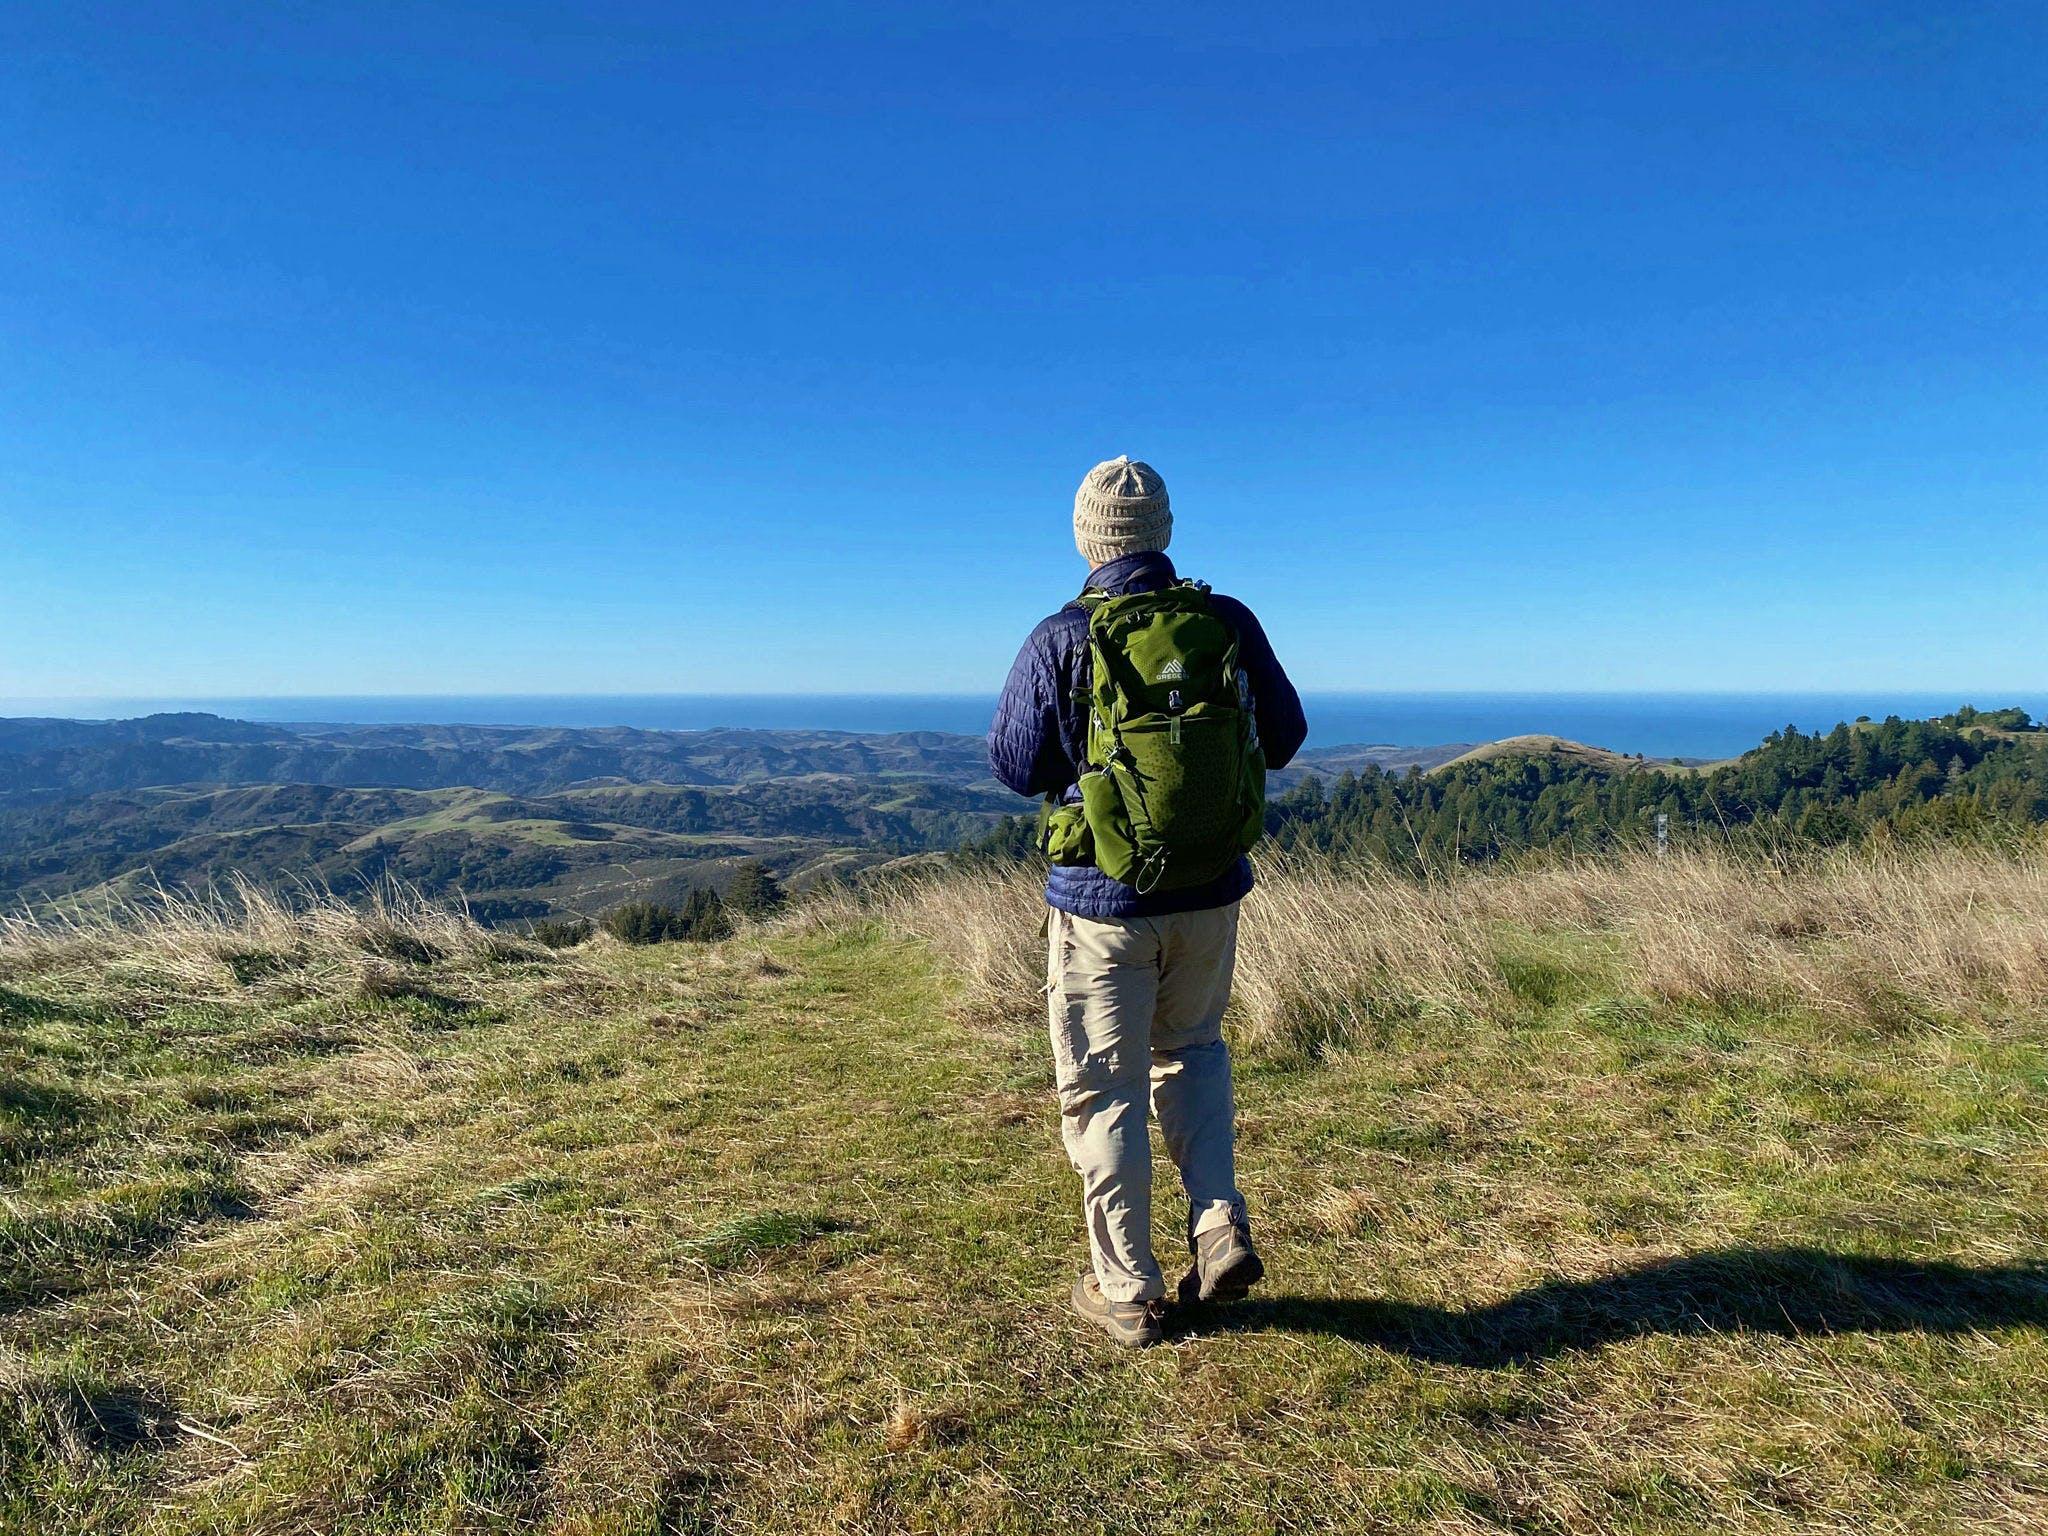 Man standing at viewpoint overlooking Santa Cruz Mountains at Upper La Honda Creek Preserve